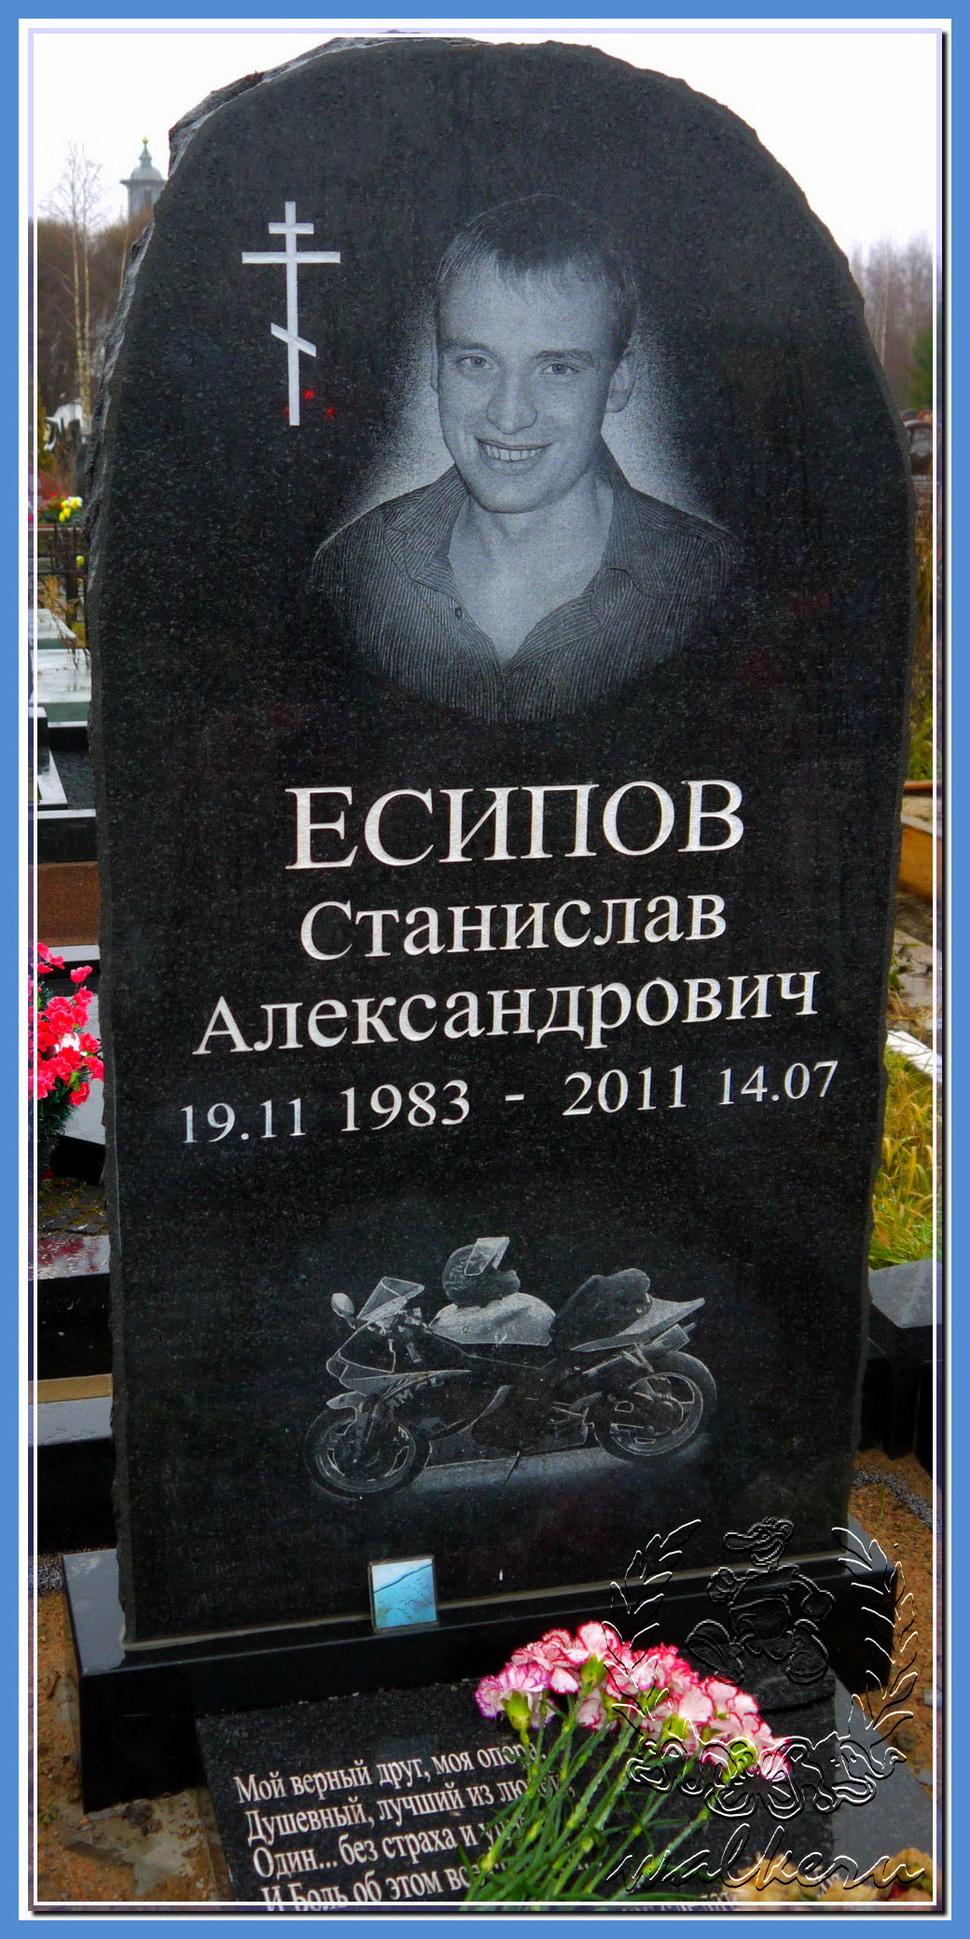 Есипов Станислав Александрович